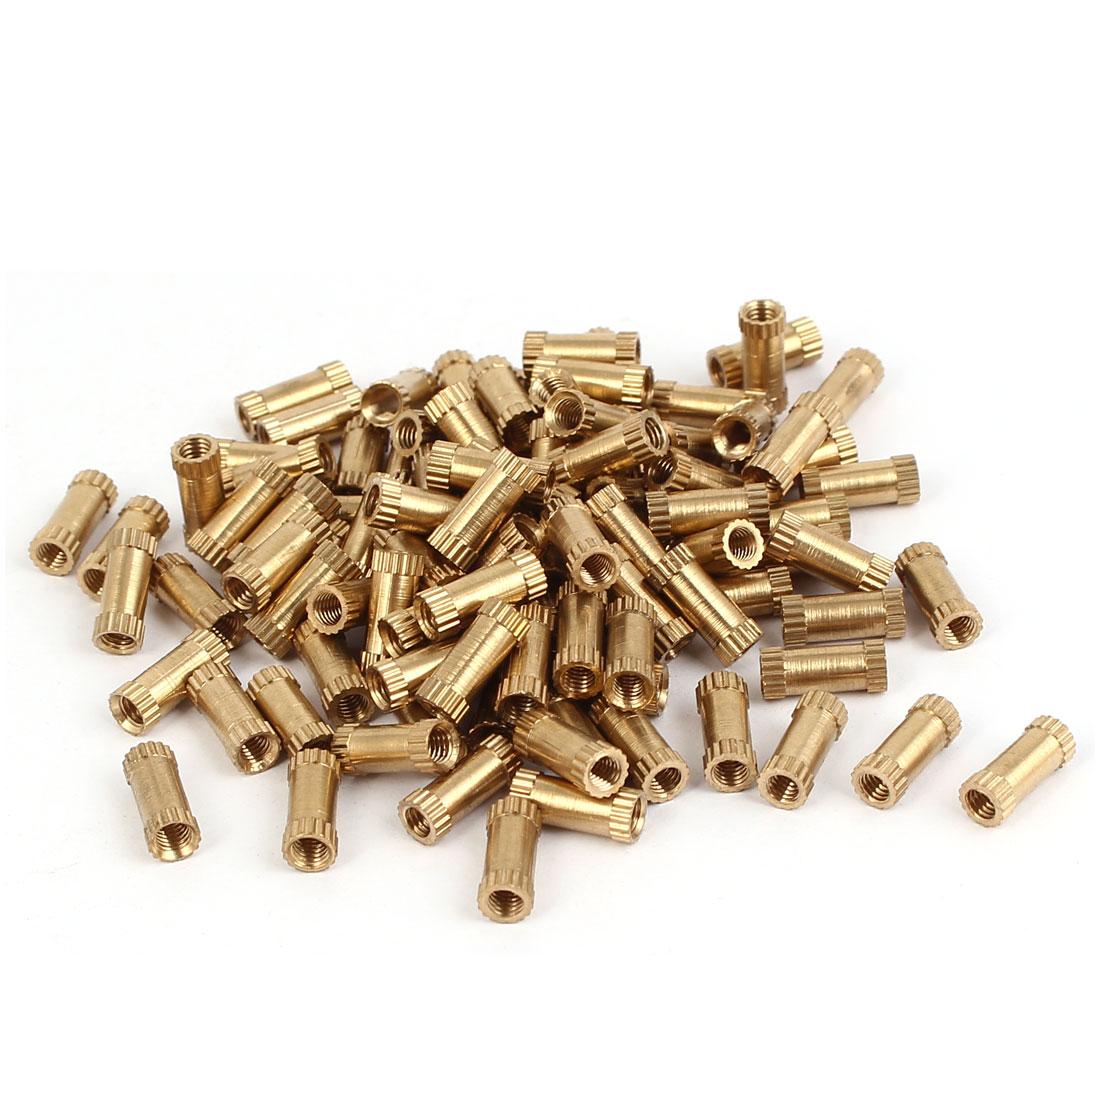 M3 x 10mm Brass Cylinder Knurled Threaded Round Insert Embedded Nuts 100PCS